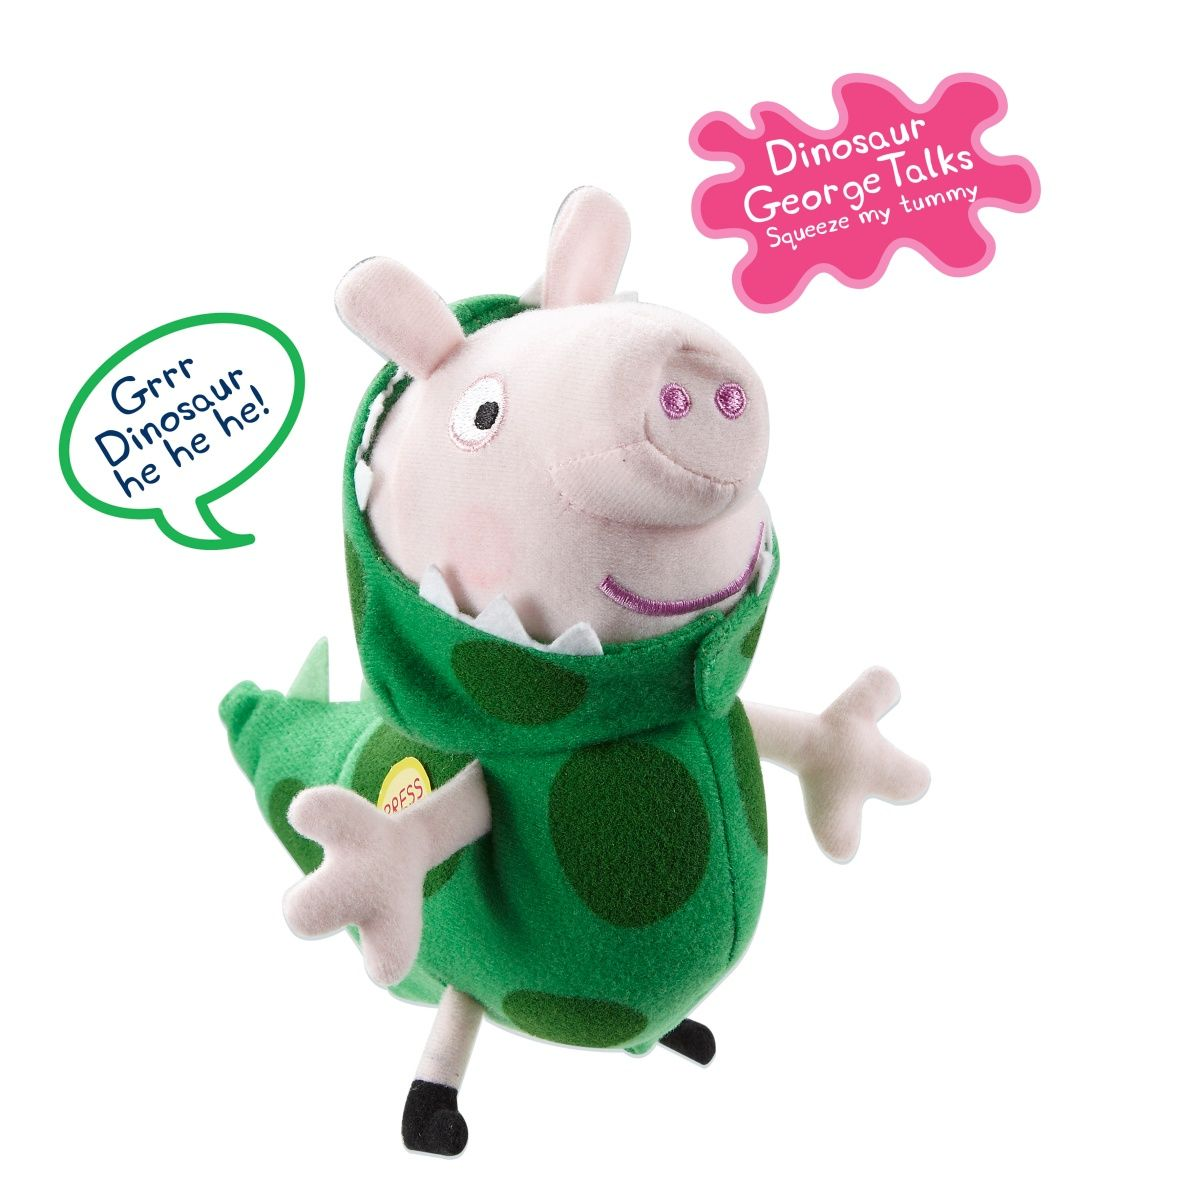 Peppa Pig Plush Asstortment Smyths Toys Peppa Pig Plush Peppa